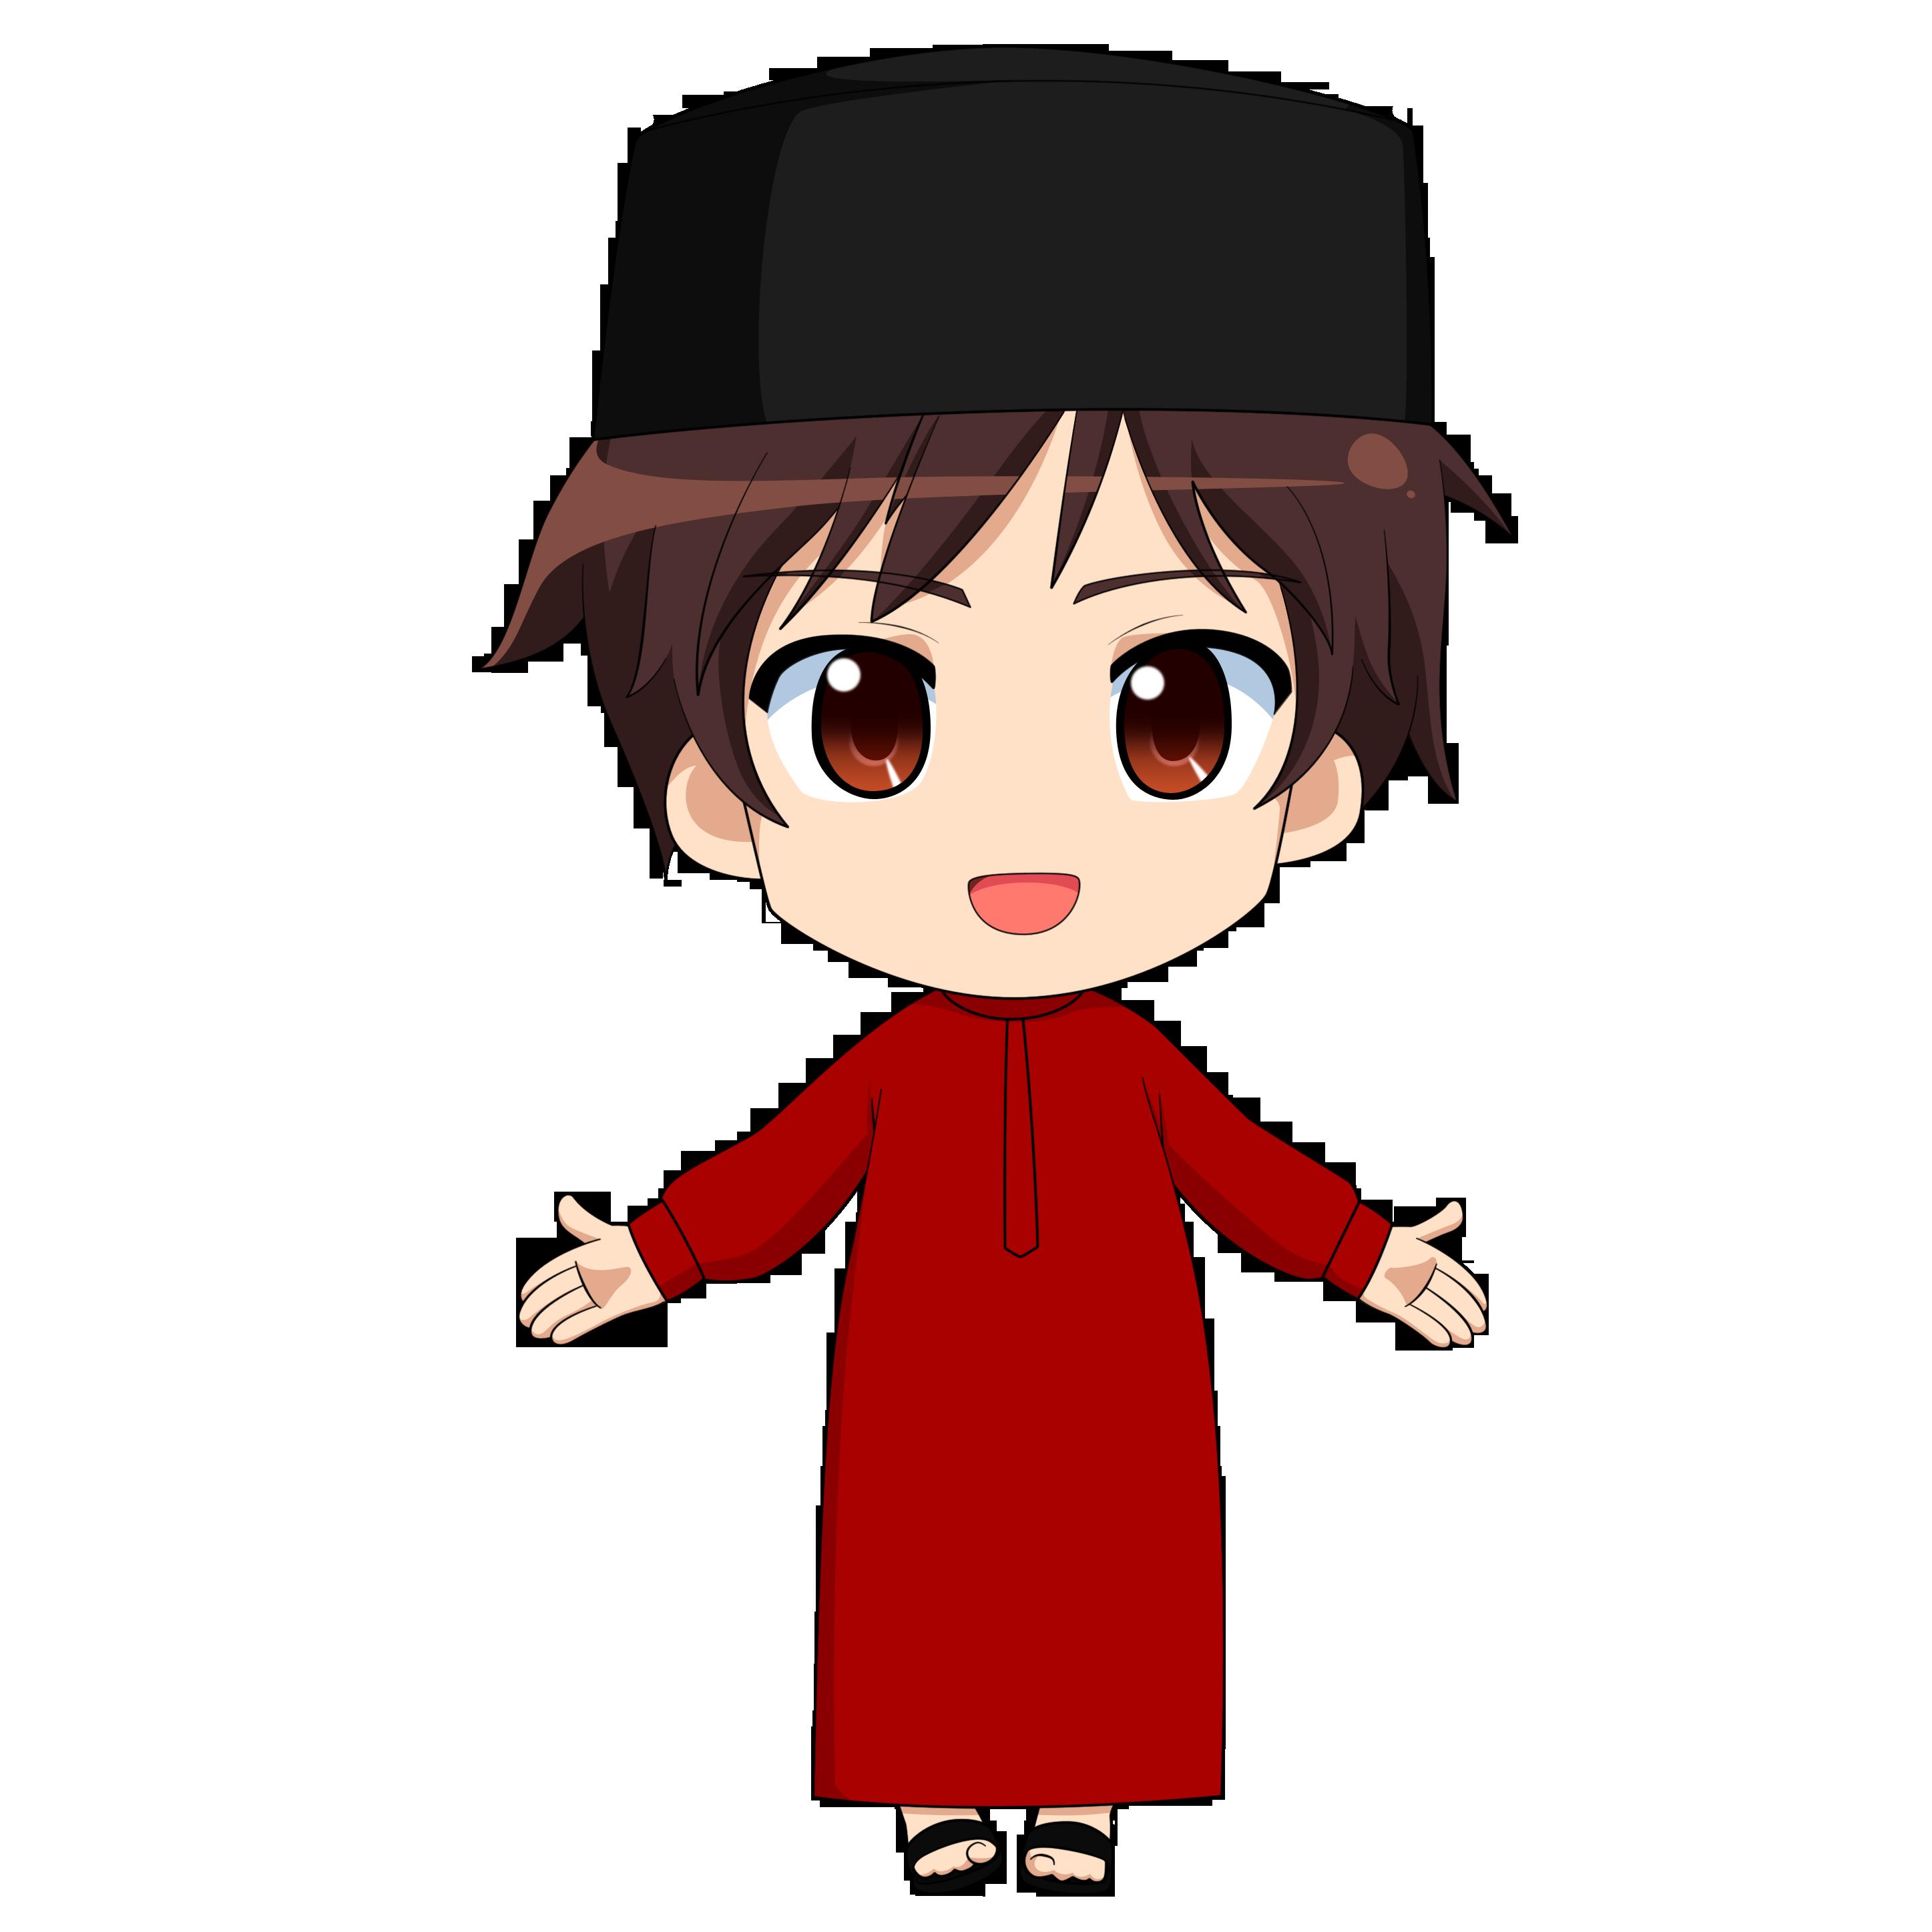 chibi_muslimin_1_by_taj92d8fuxe6.png (2894×2894) Kartun